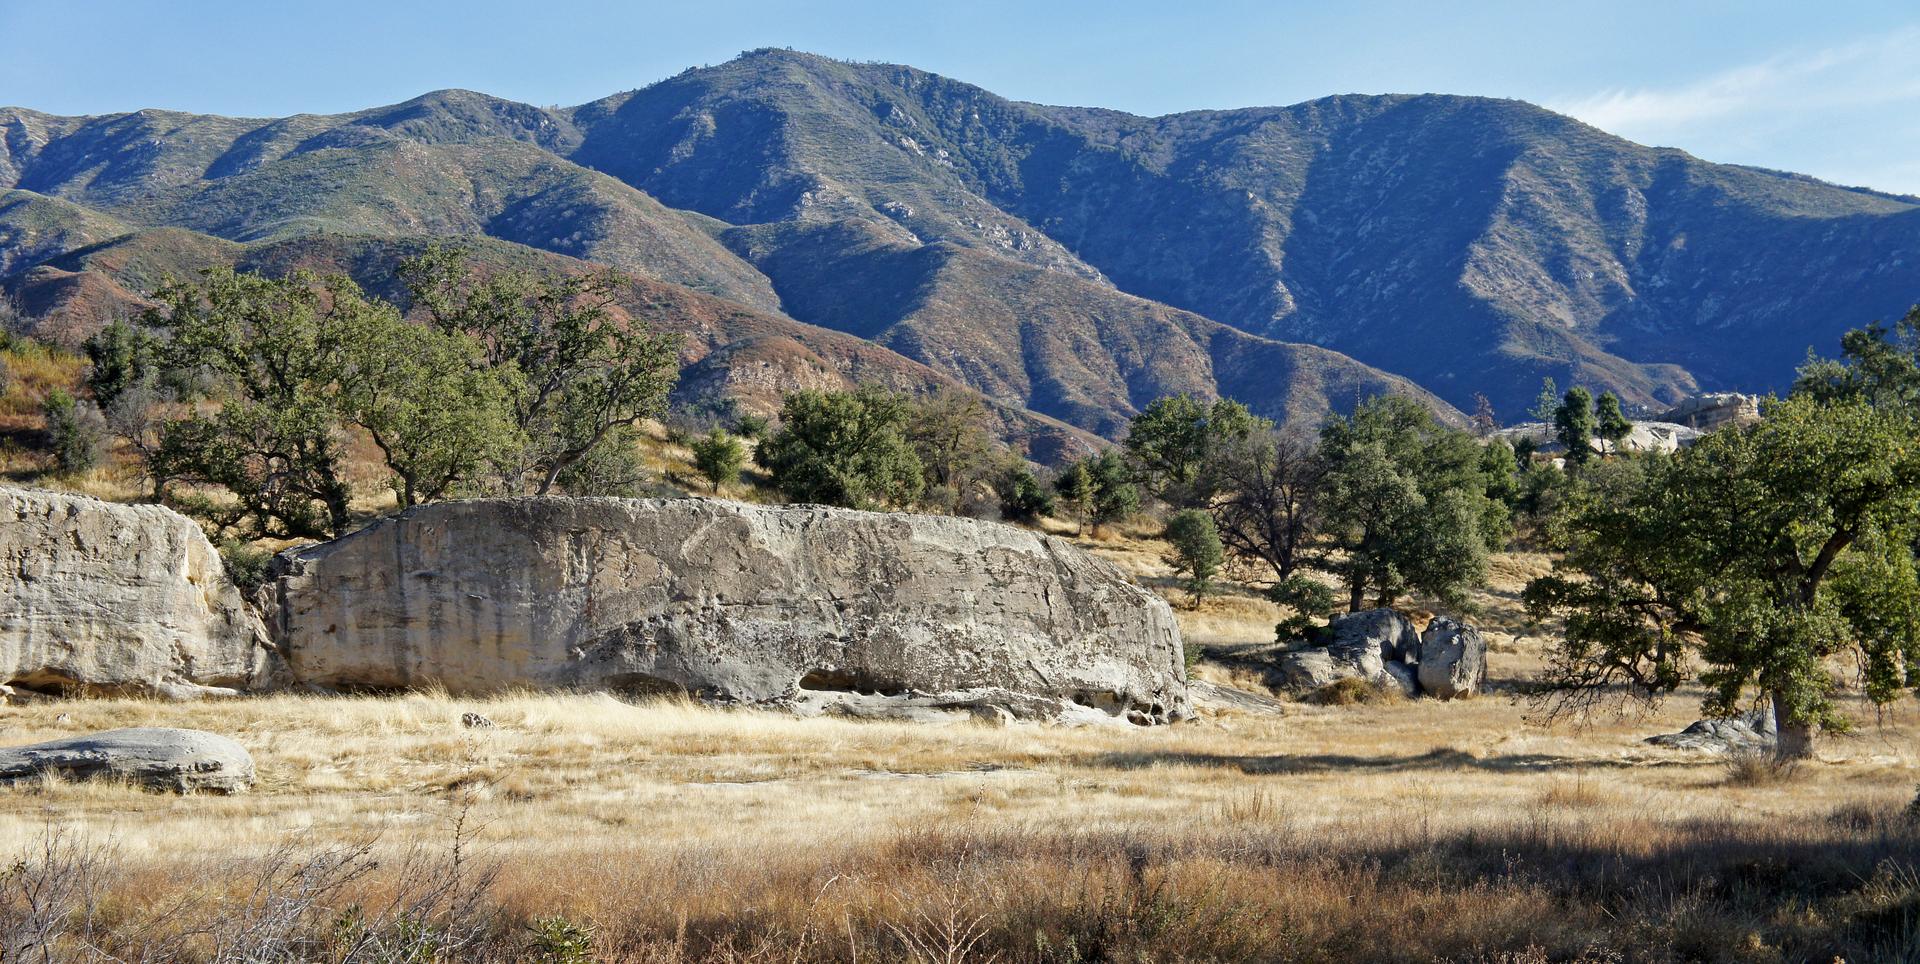 the highest peak in the Ventana Wilderness, California